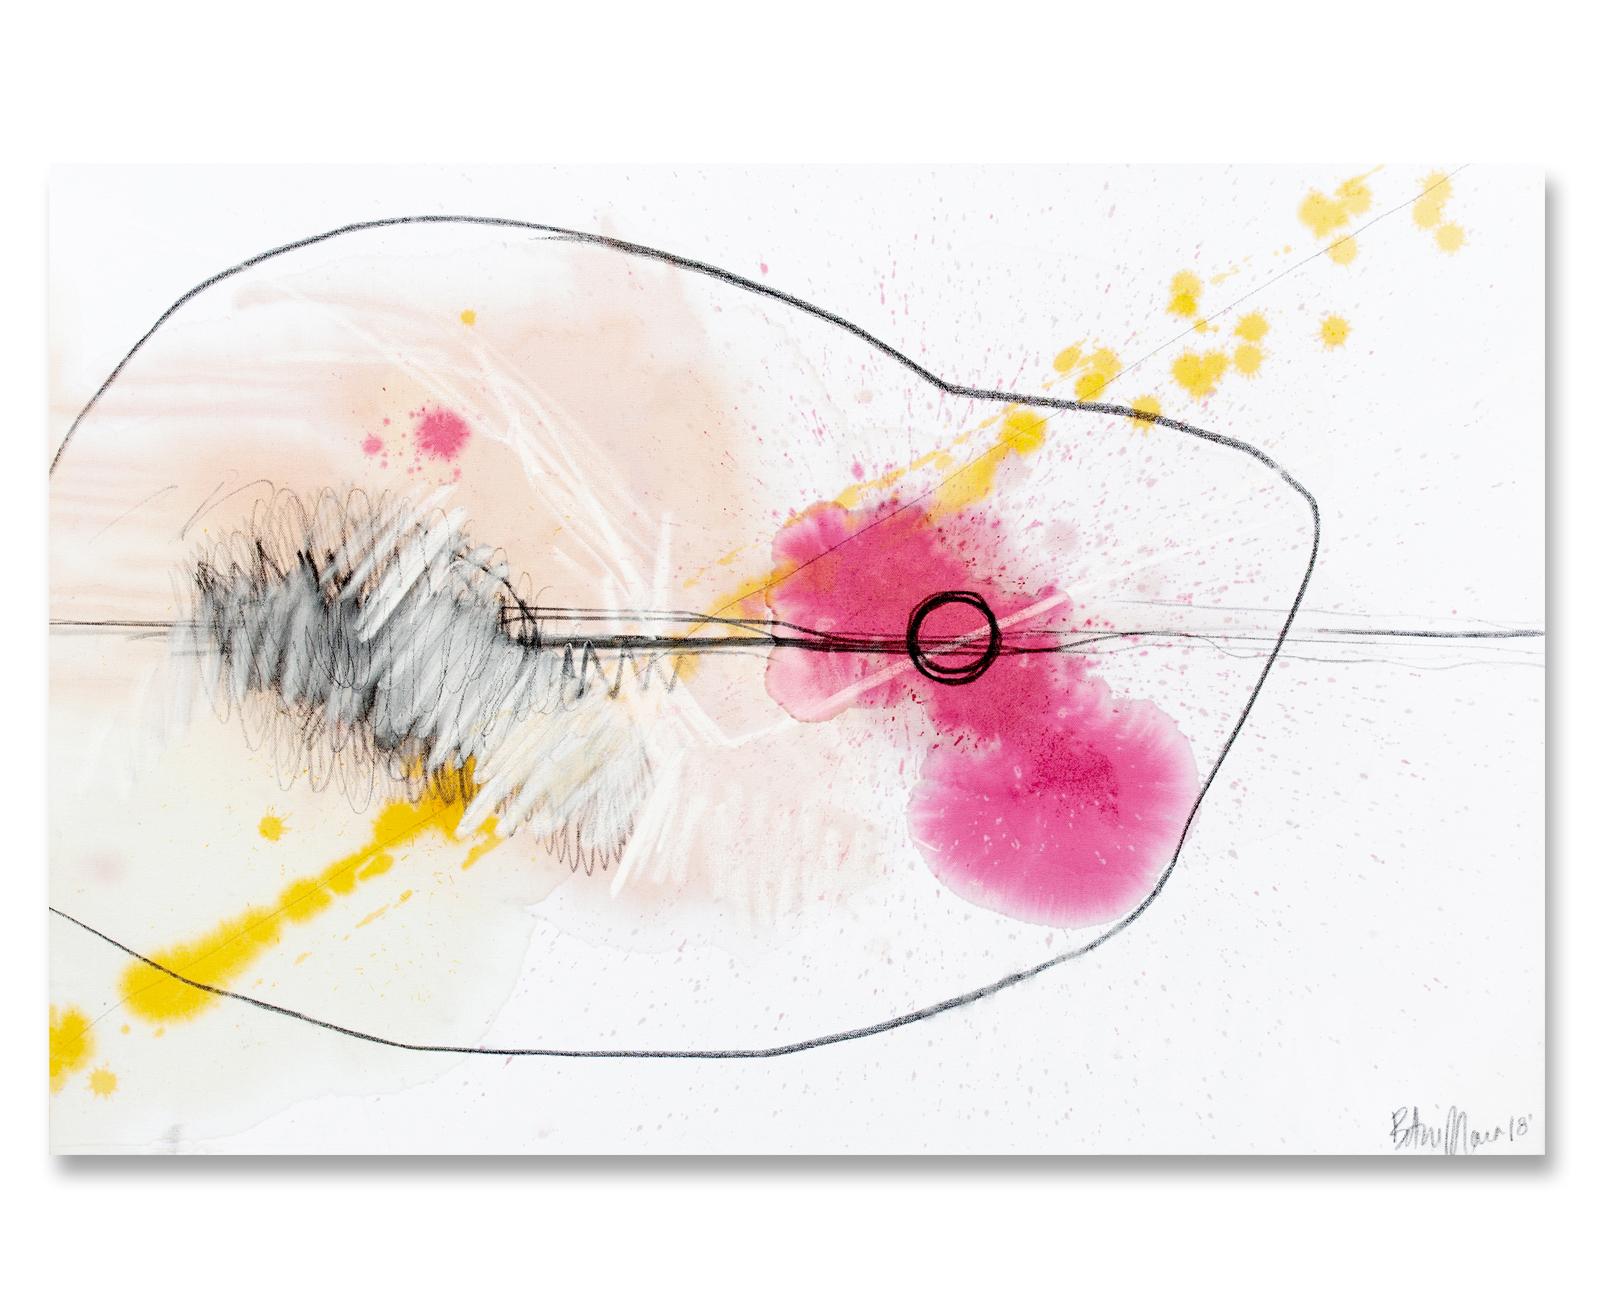 """AVOCADO GUACAMOLE"" - 24'' x 36''Avocado pits, hibiscus flower, saffron, charcoal and chalk on canvas.2018INQUIRE"